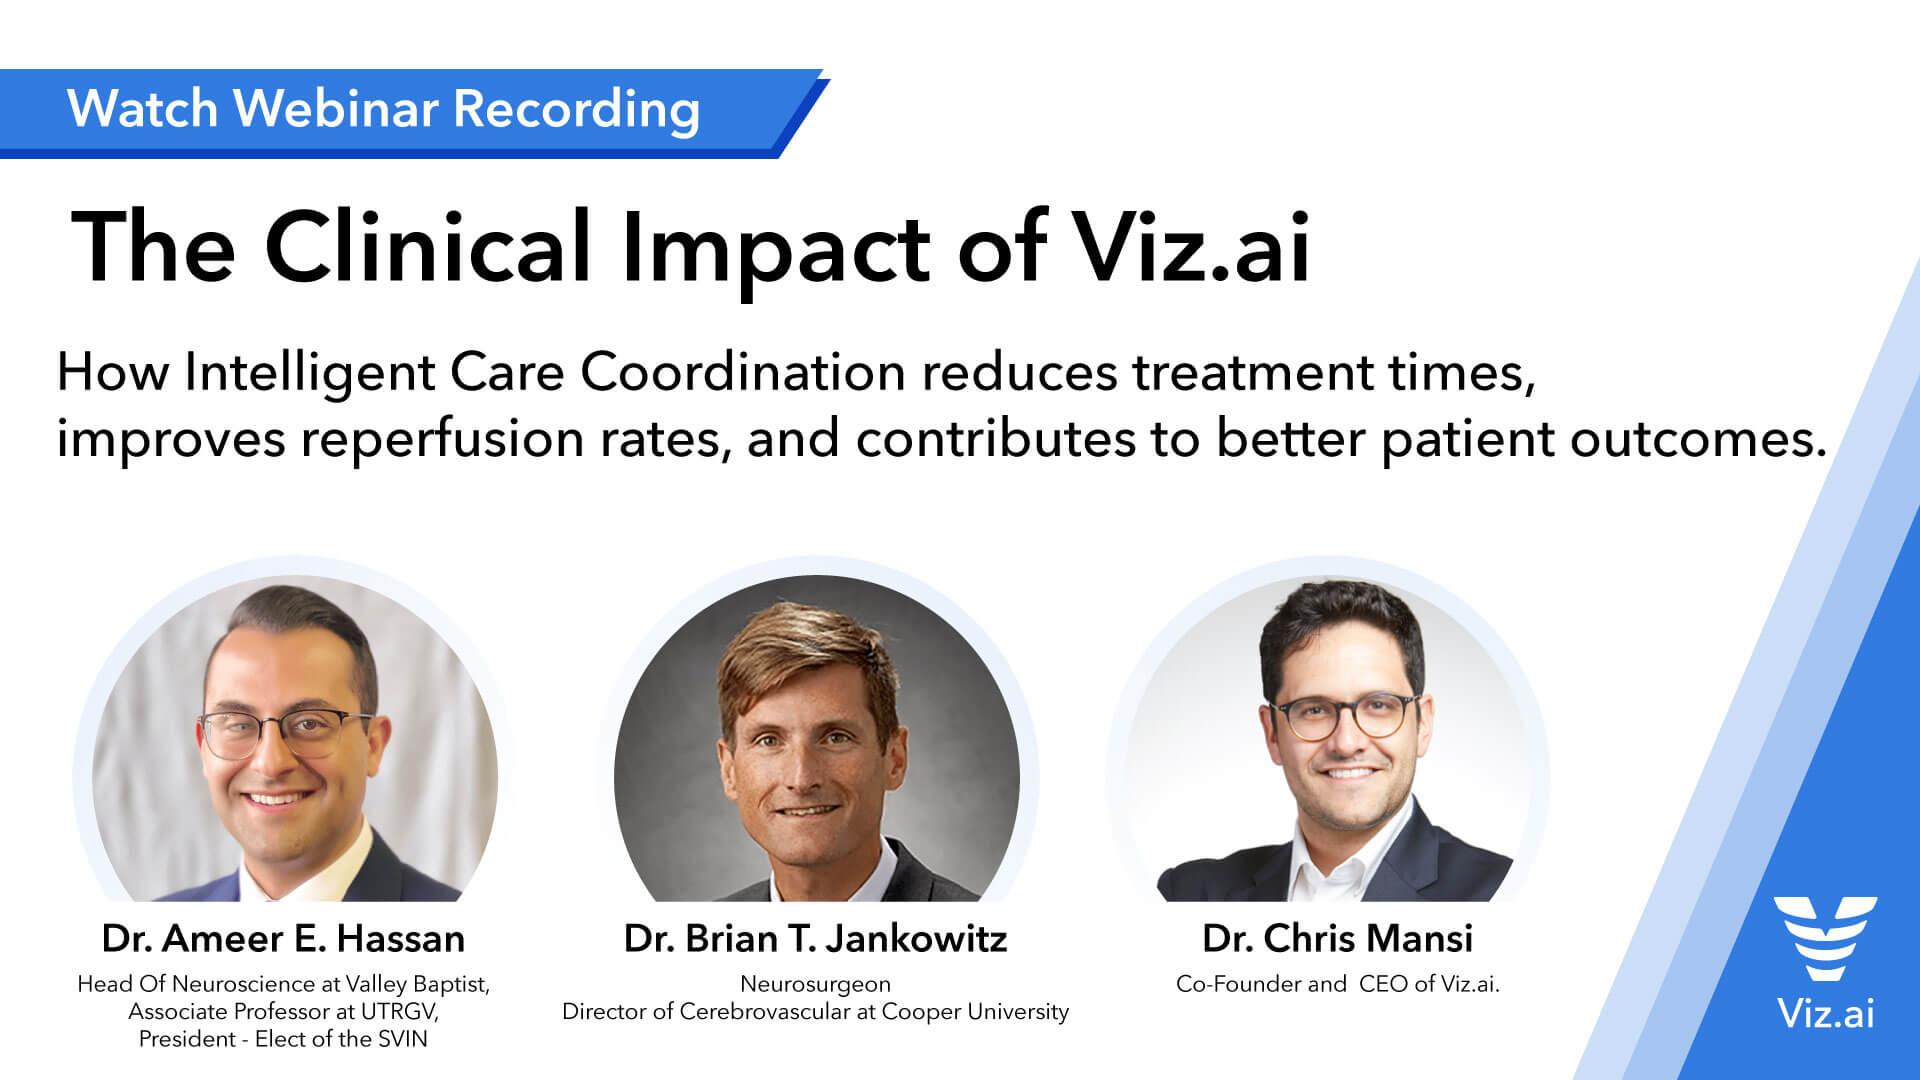 The Clinical Impact of Viz.ai